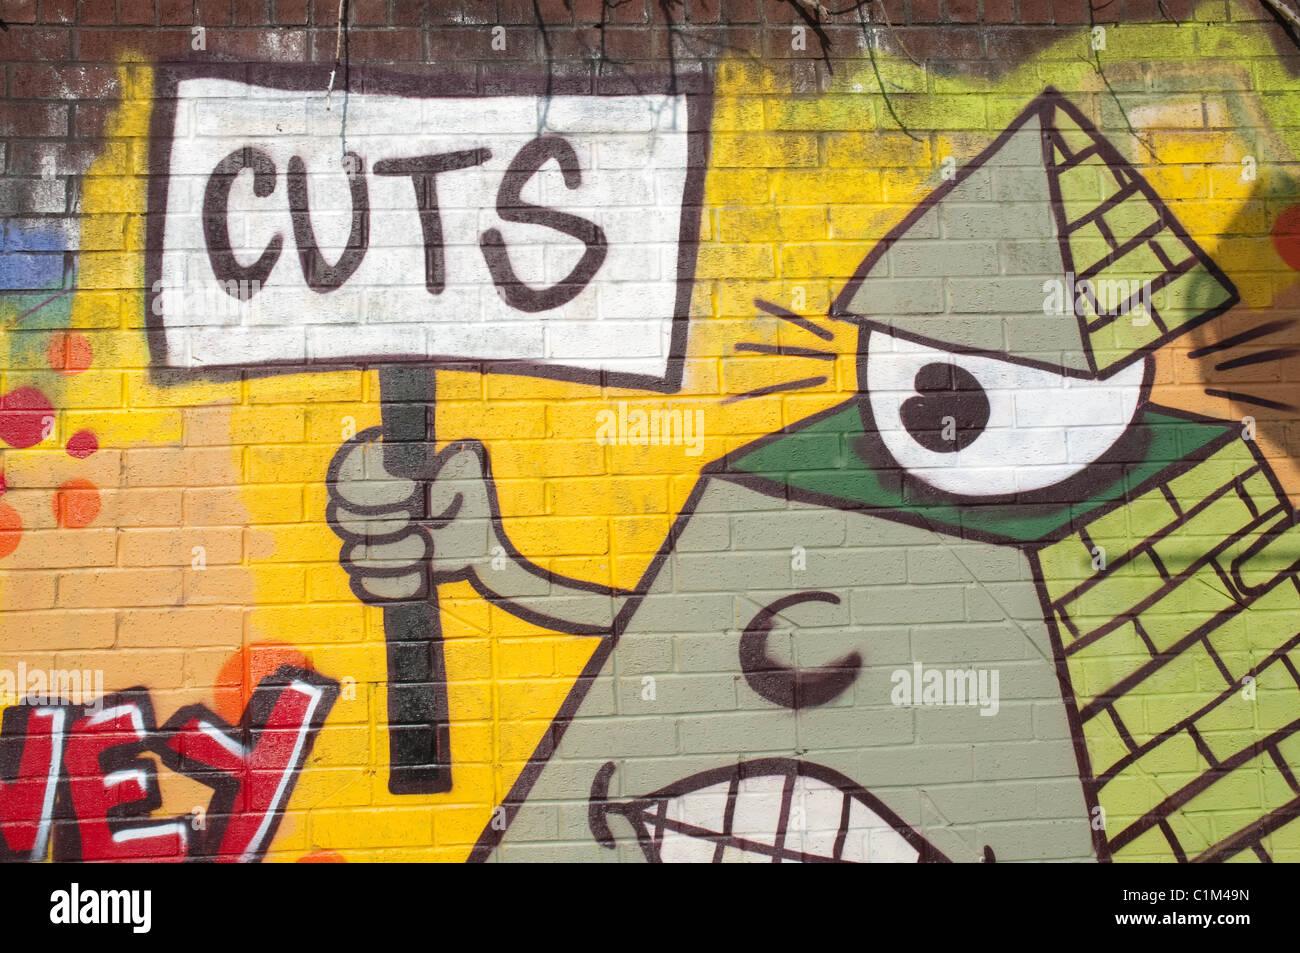 Cuts graffiti. - Stock Image